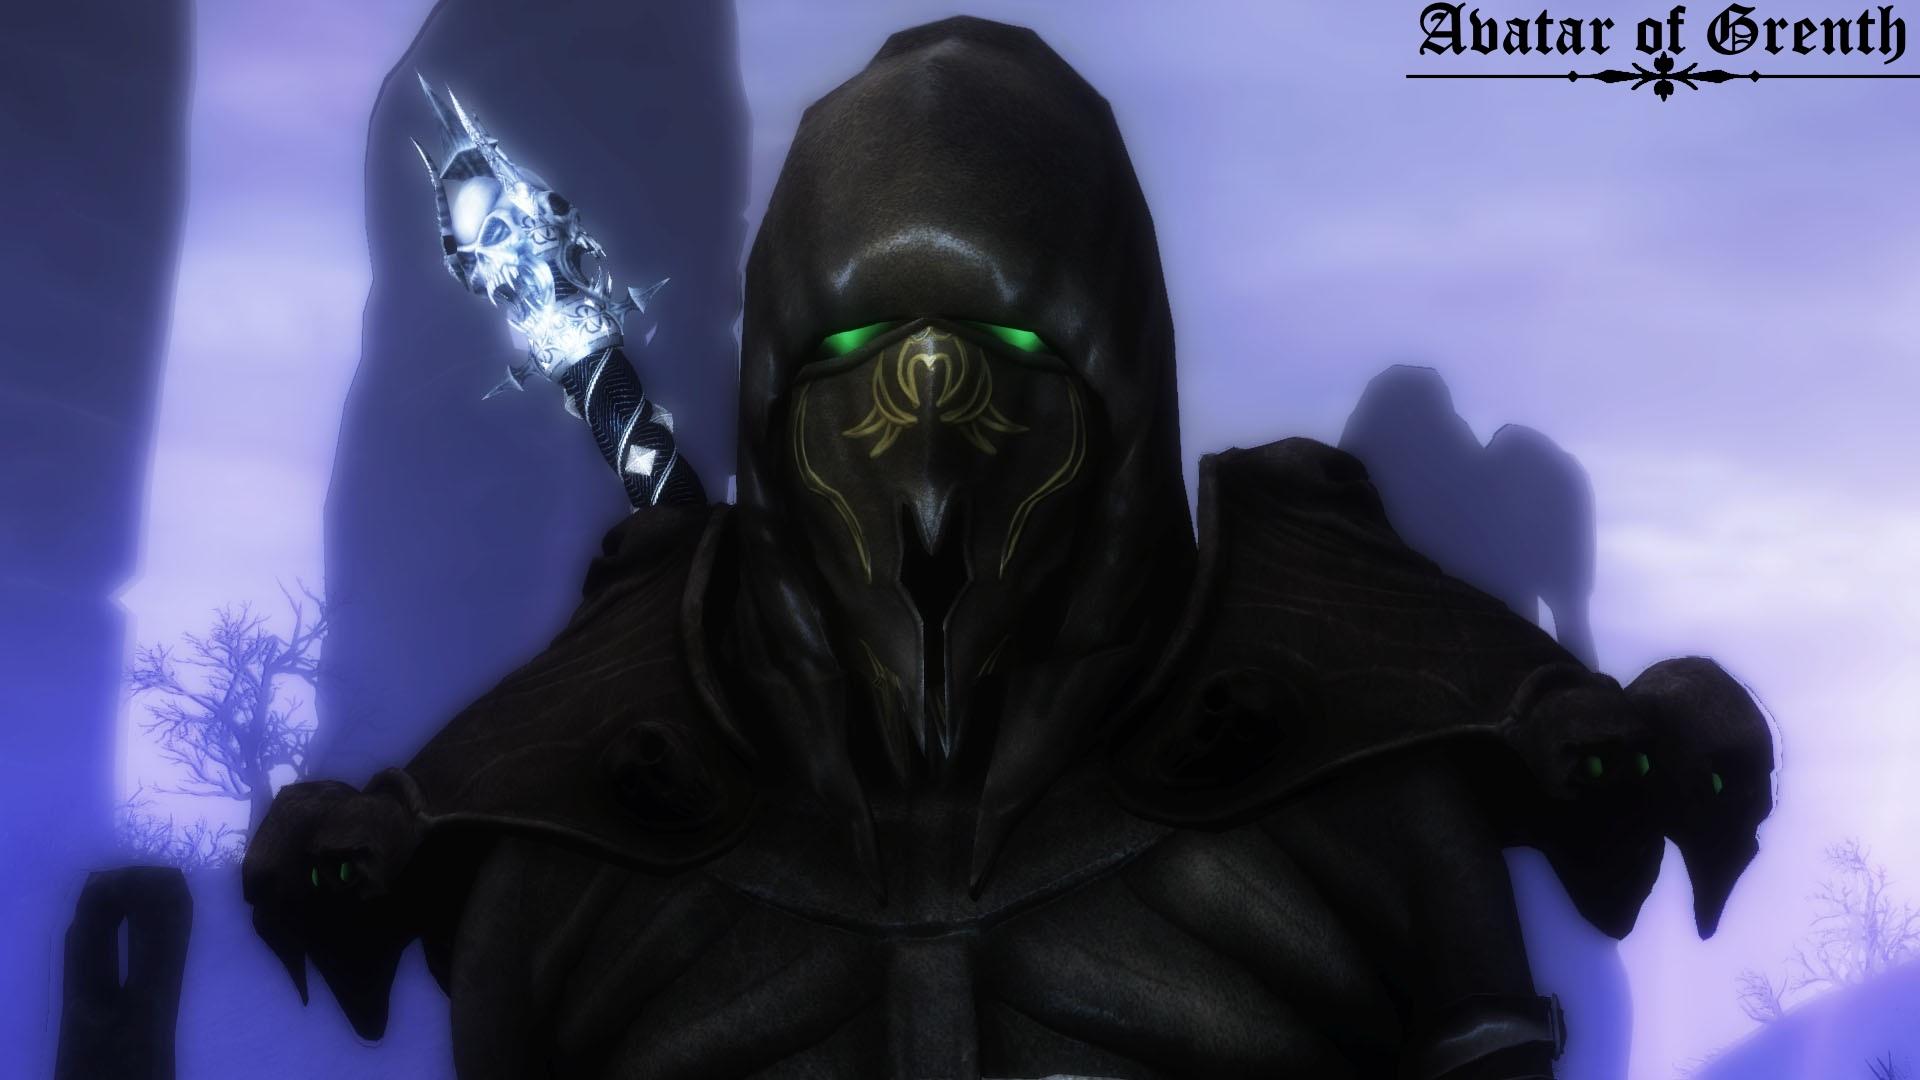 Avatar_of_Grenth.jpg